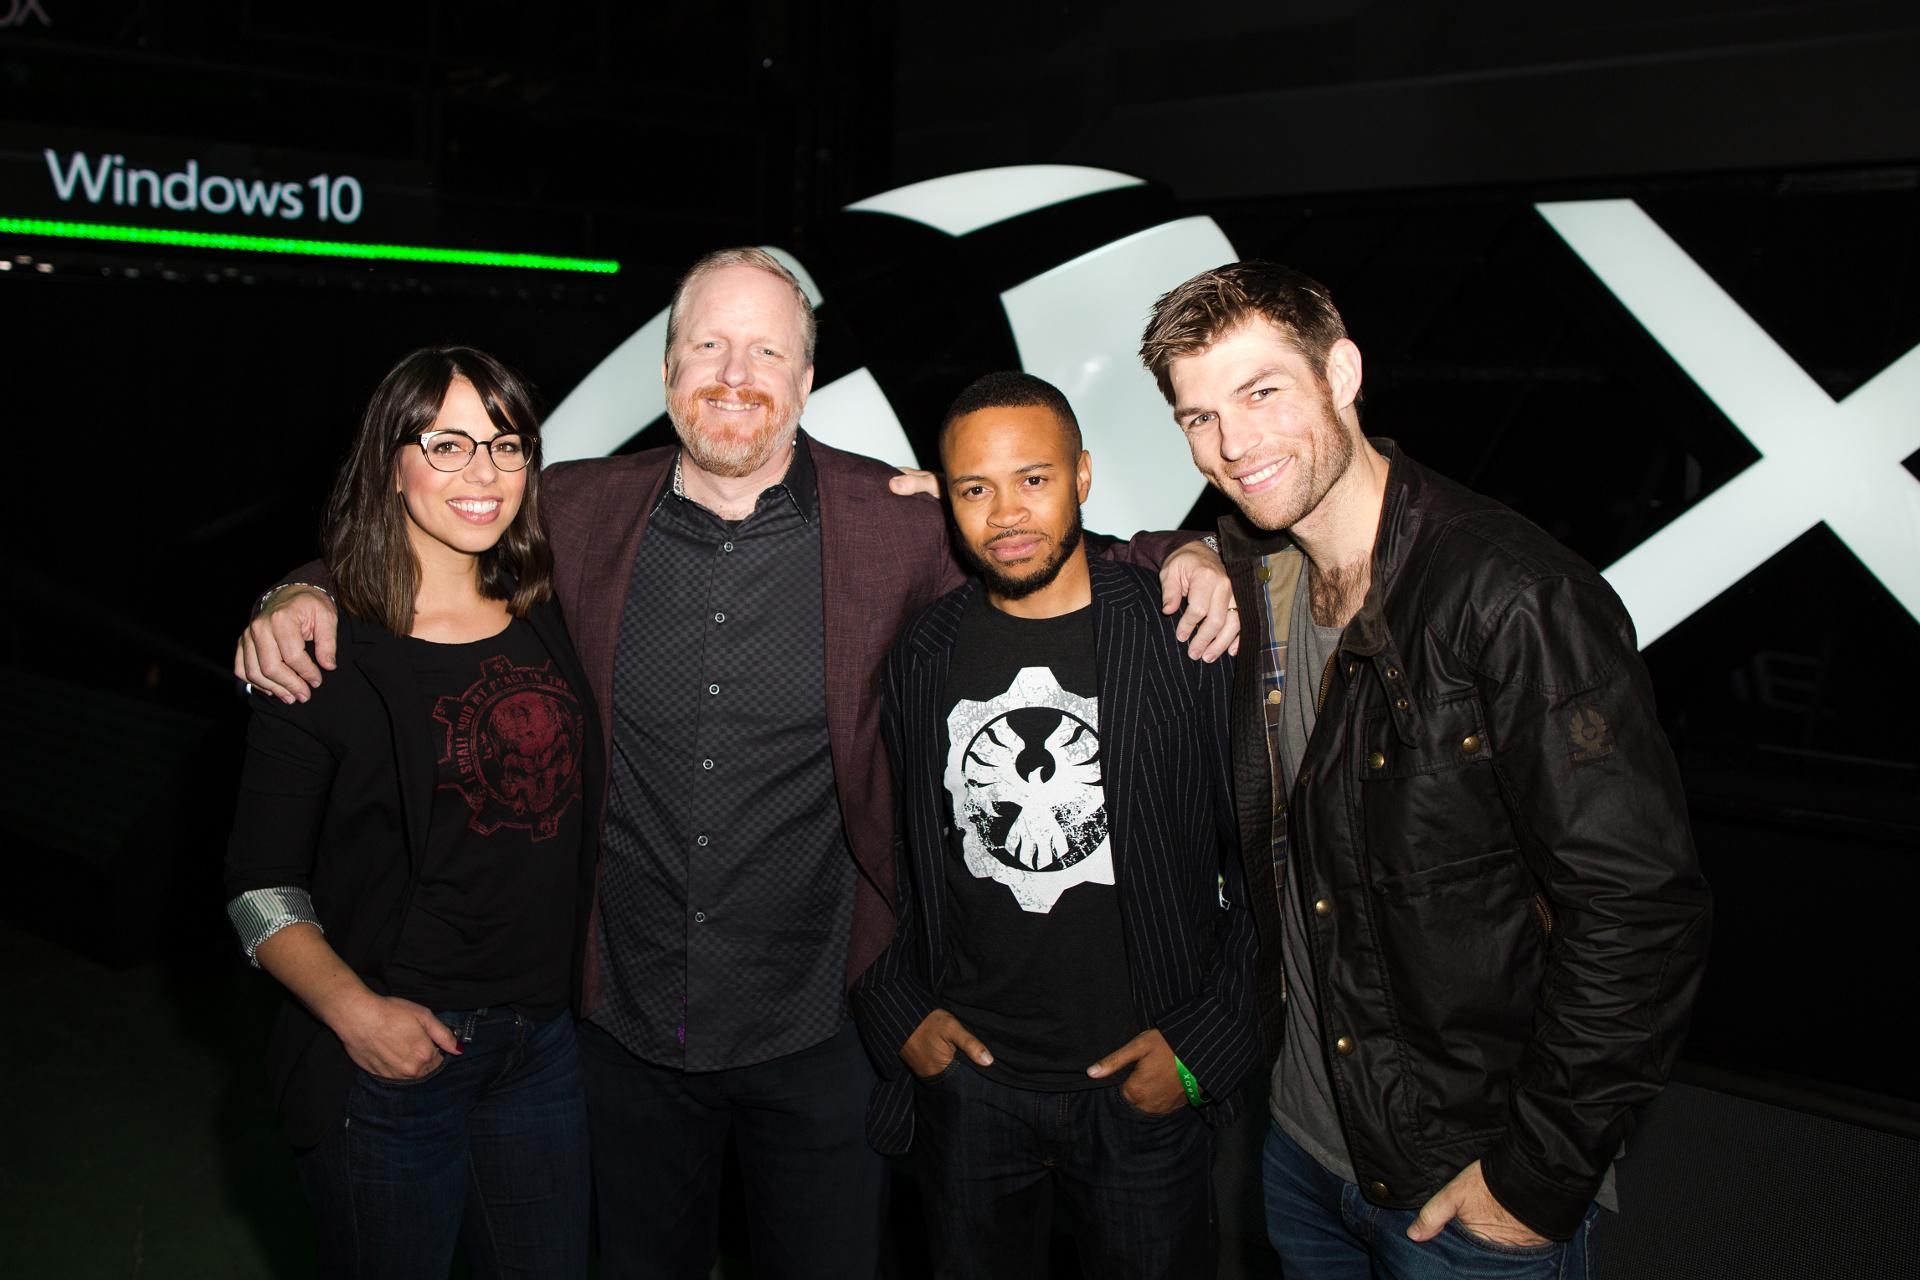 Gears of War 4 voice cast at E3 2016